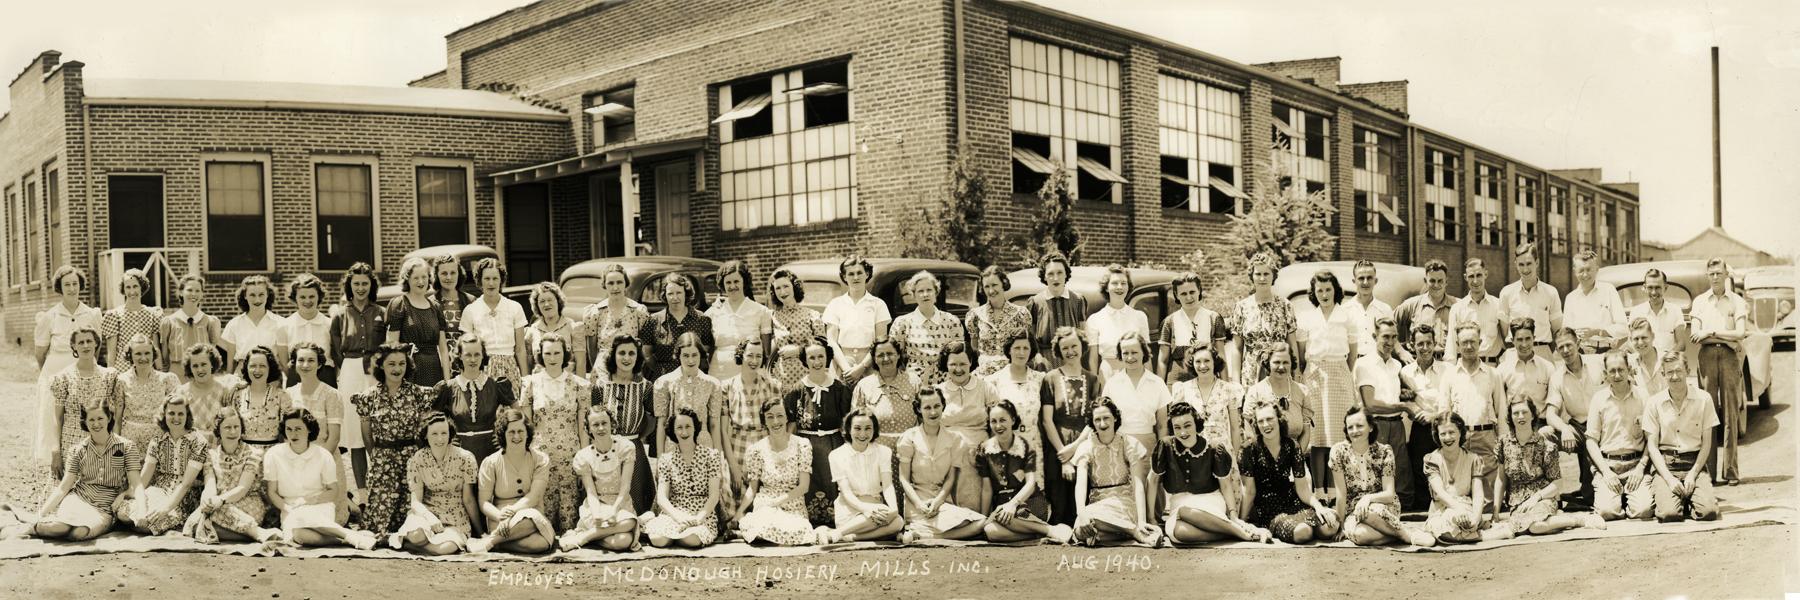 McDonough Hosire Mill 1940.jpg